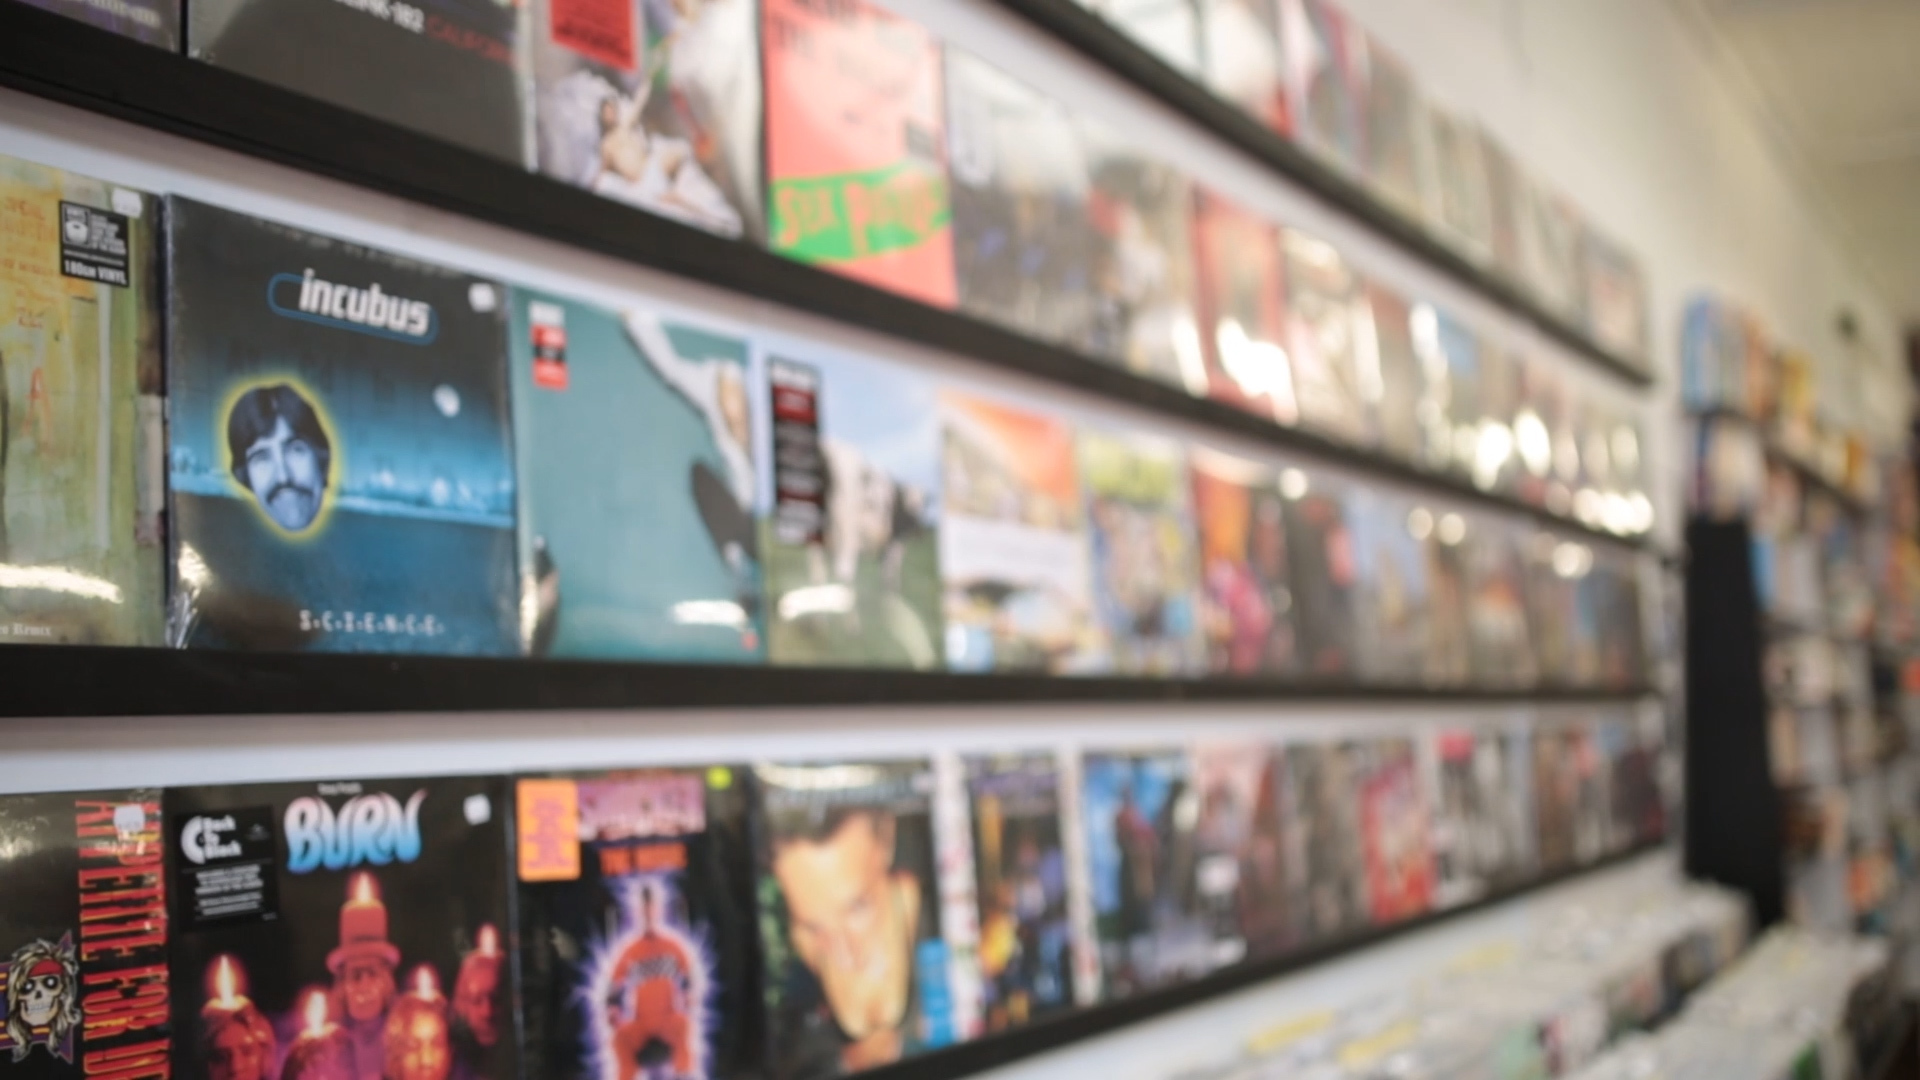 Secrets in the City, Vinyl Destination